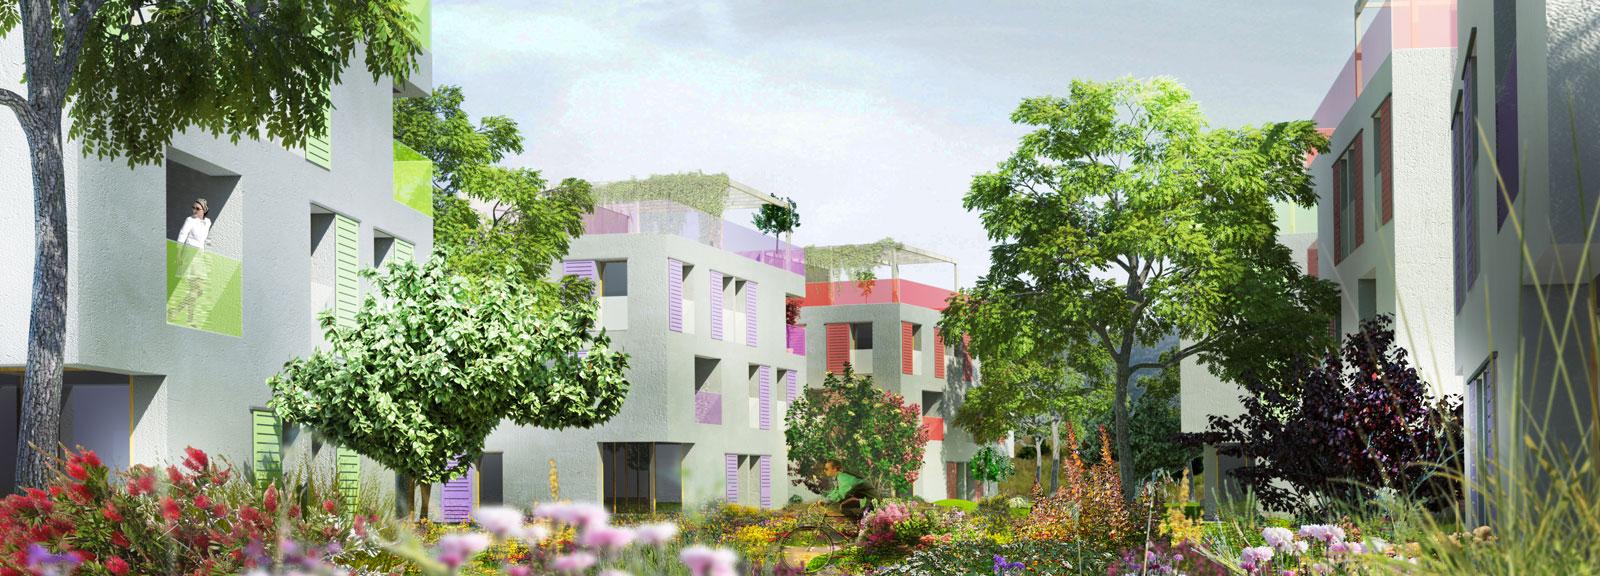 30 logements: fleurir un lieu